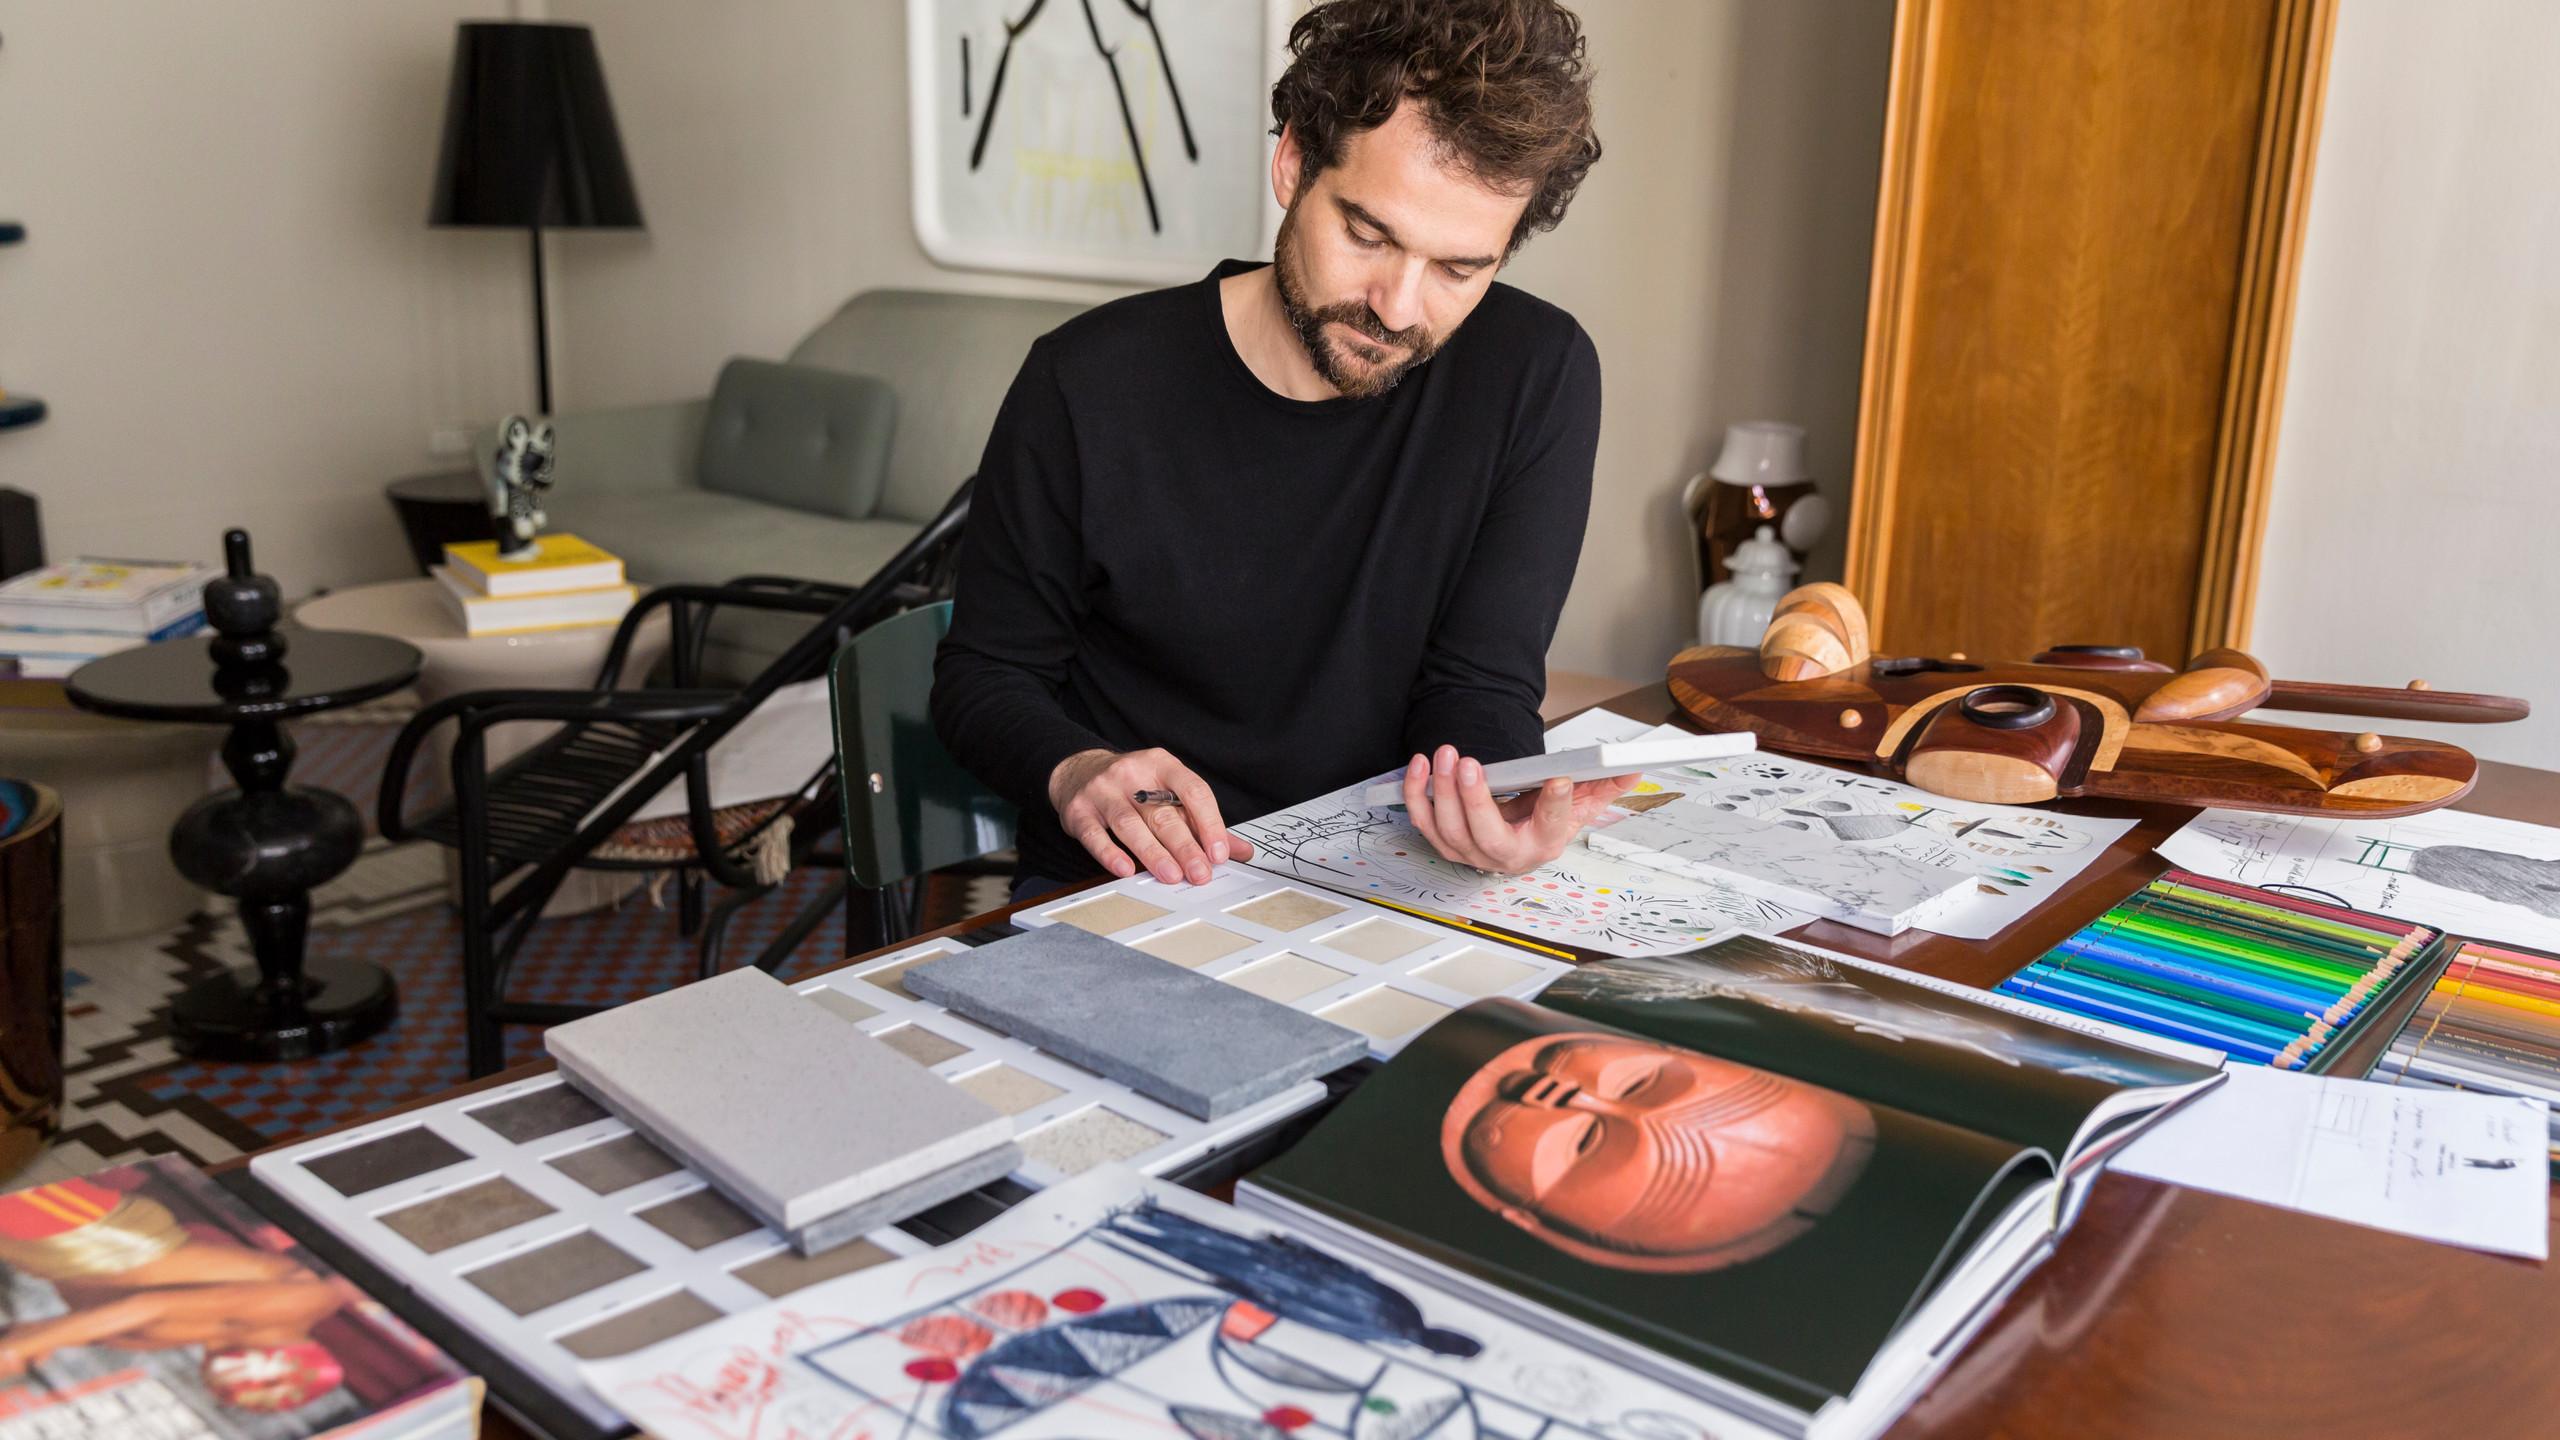 Hayon's Valencia studio - image by Andrew Habeck